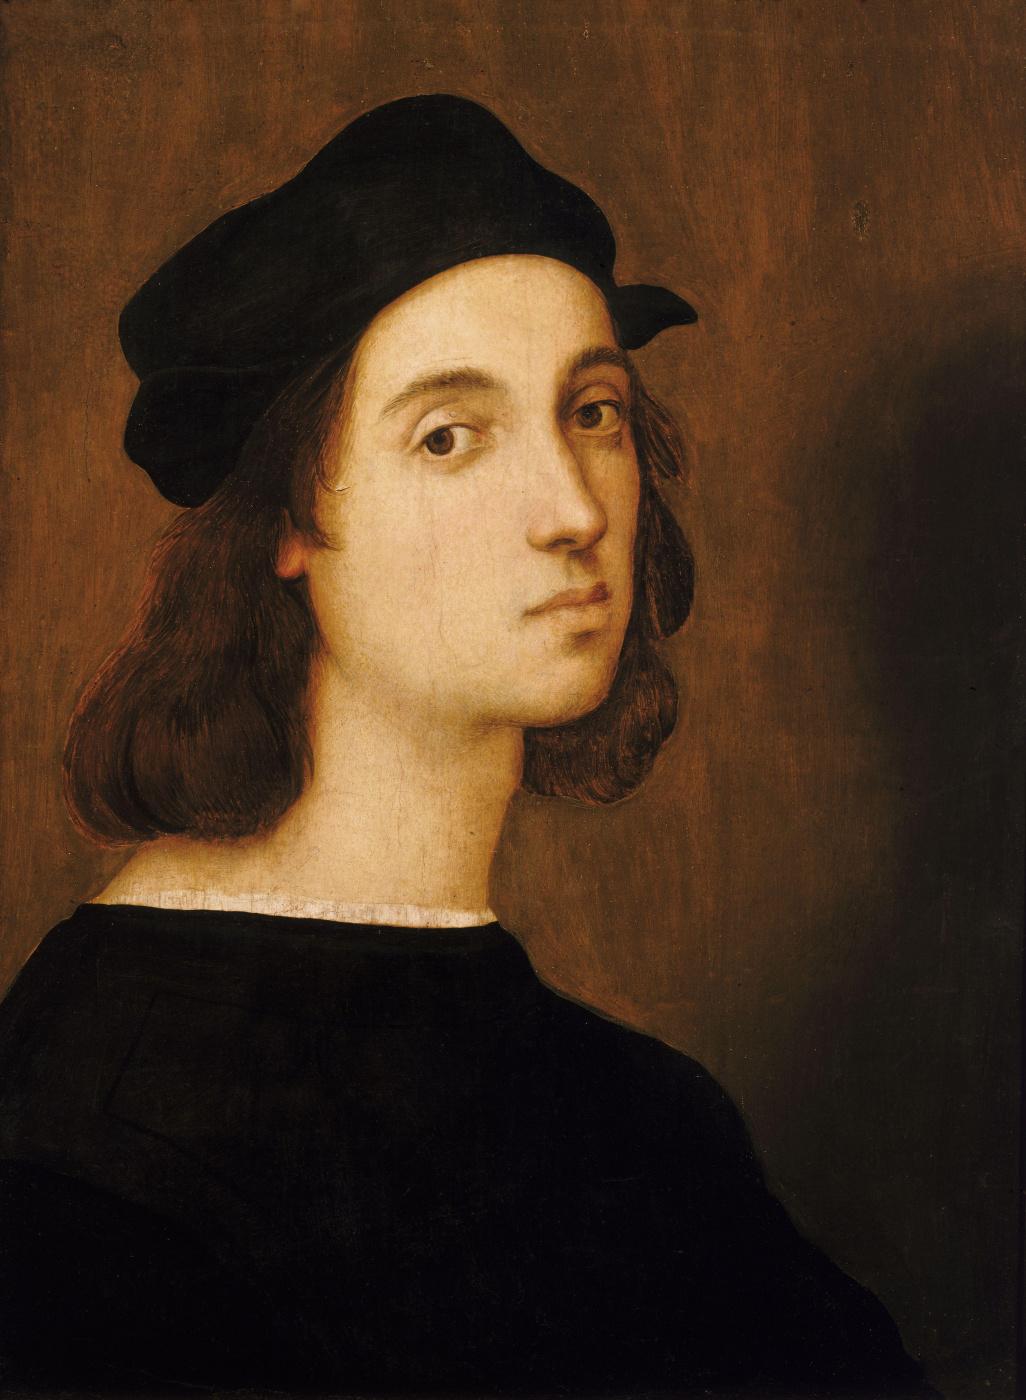 Raphael Sanzio. Self-portrait